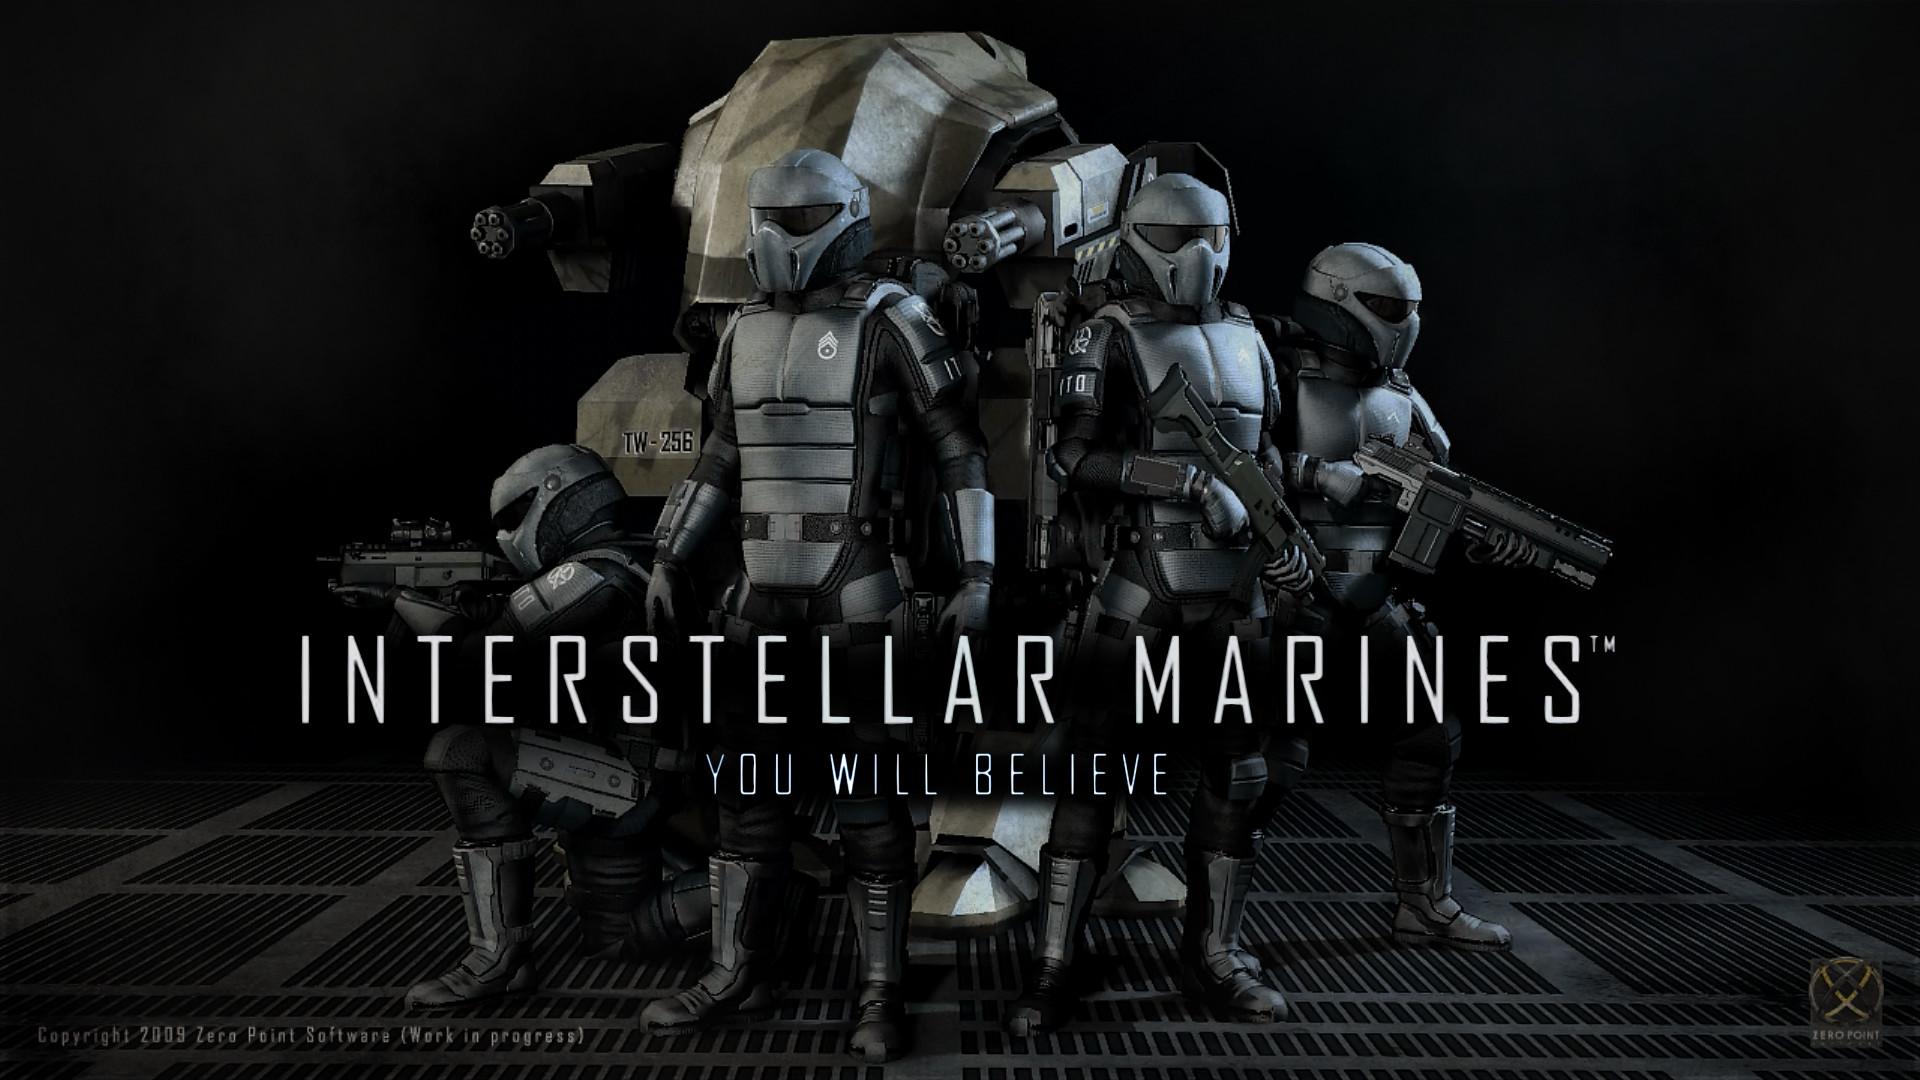 Interstellar Marines desktop fanmade by Superman999 on DeviantArt